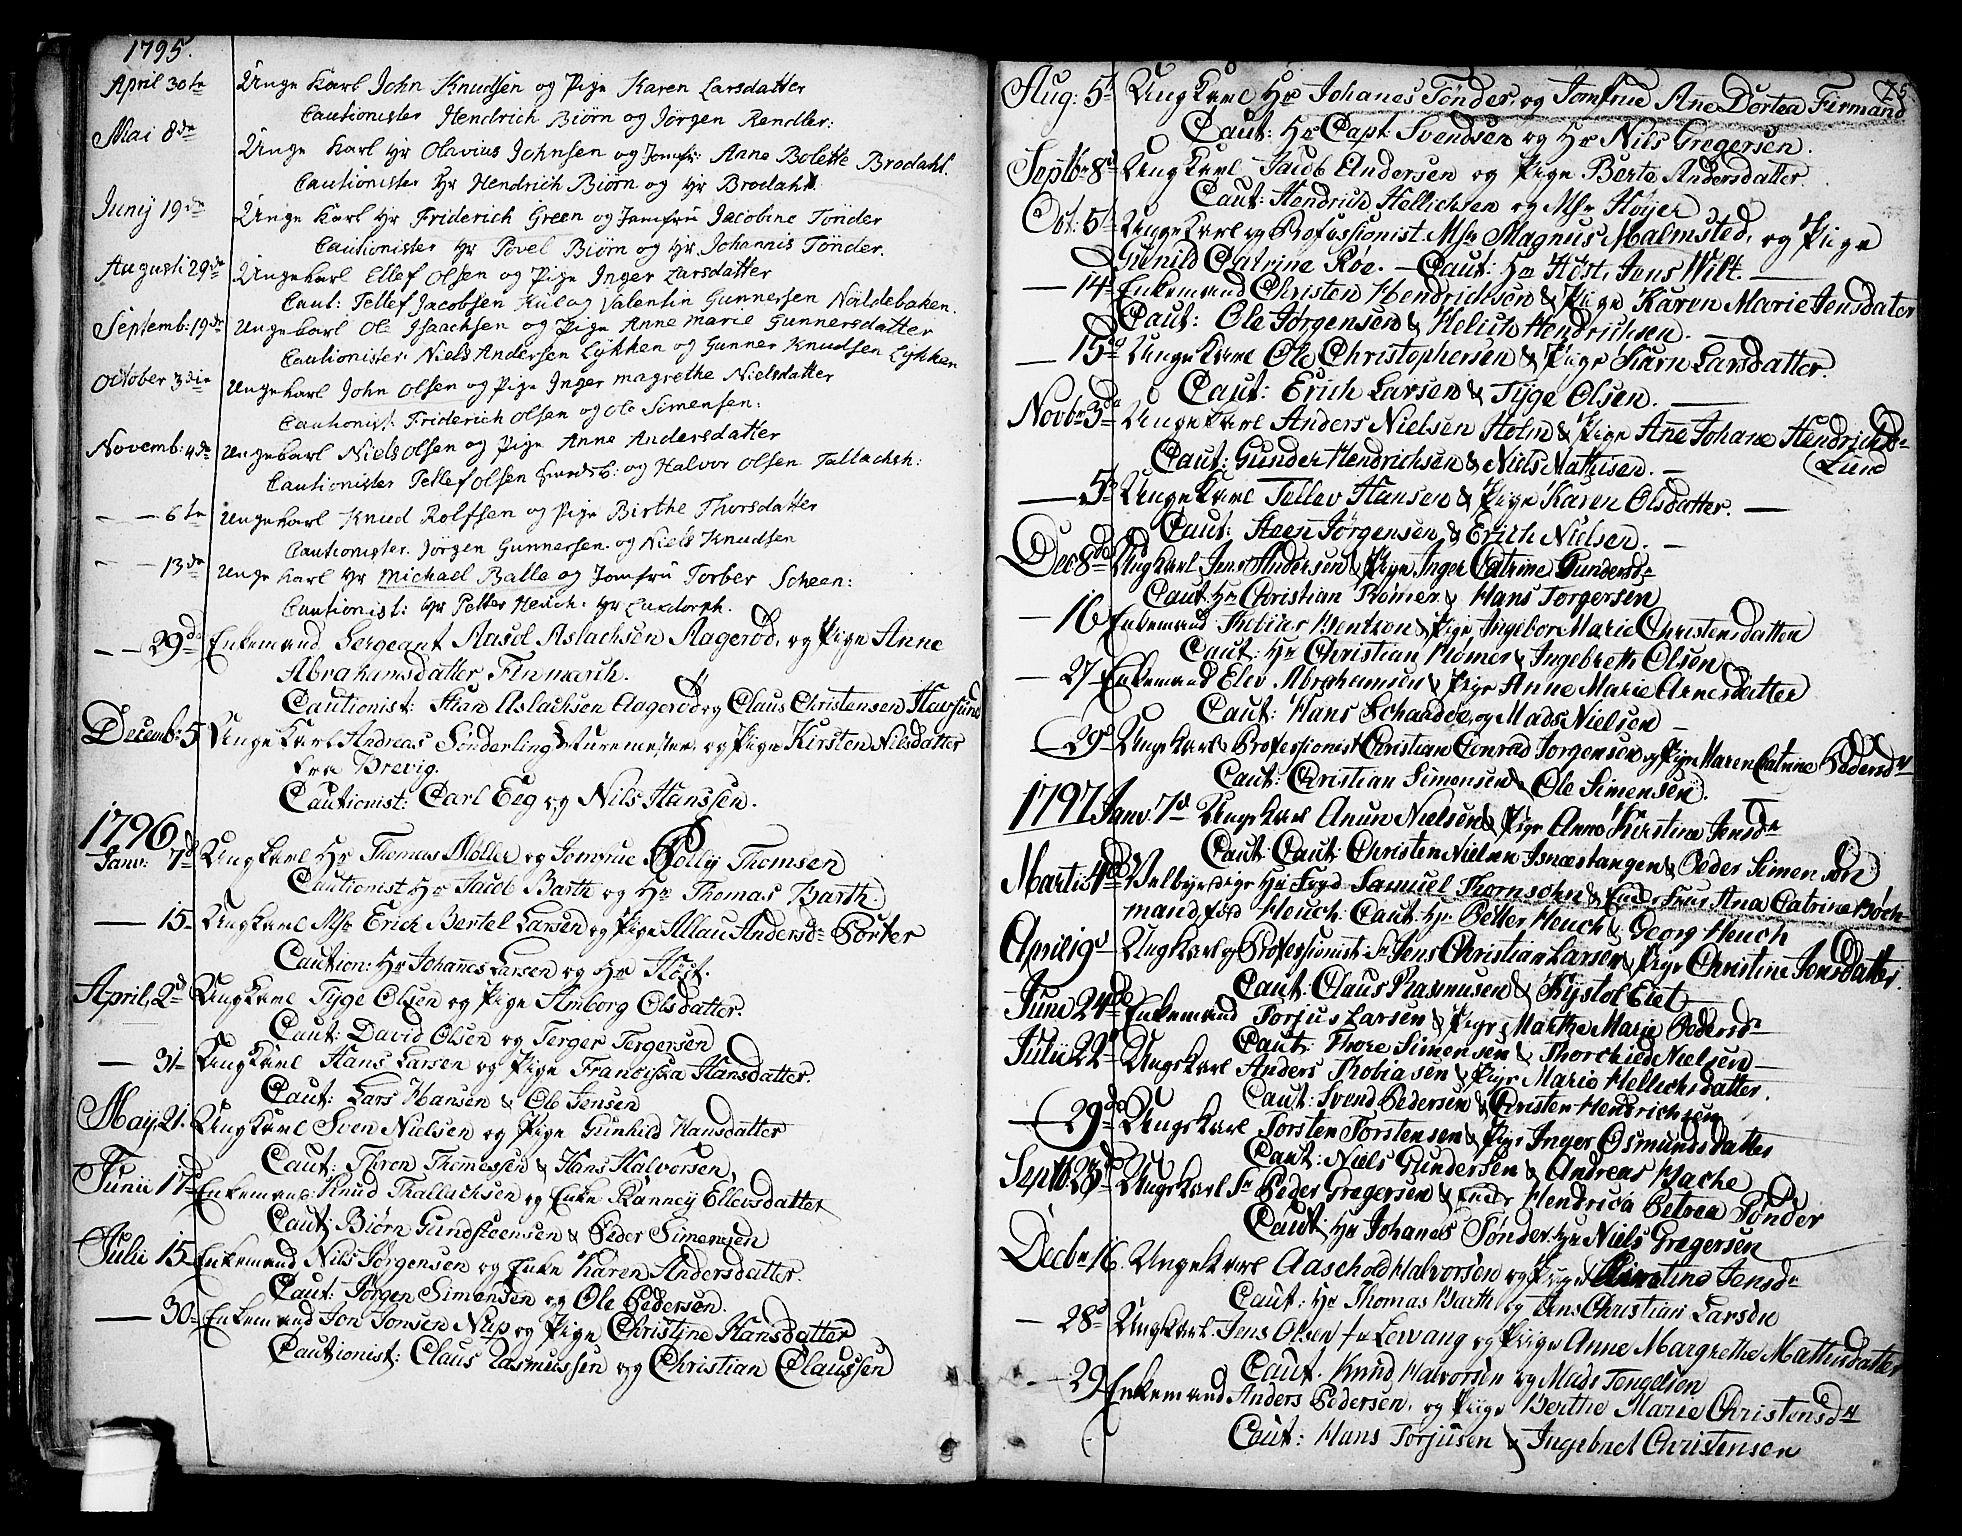 SAKO, Kragerø kirkebøker, F/Fa/L0002: Ministerialbok nr. 2, 1767-1802, s. 25